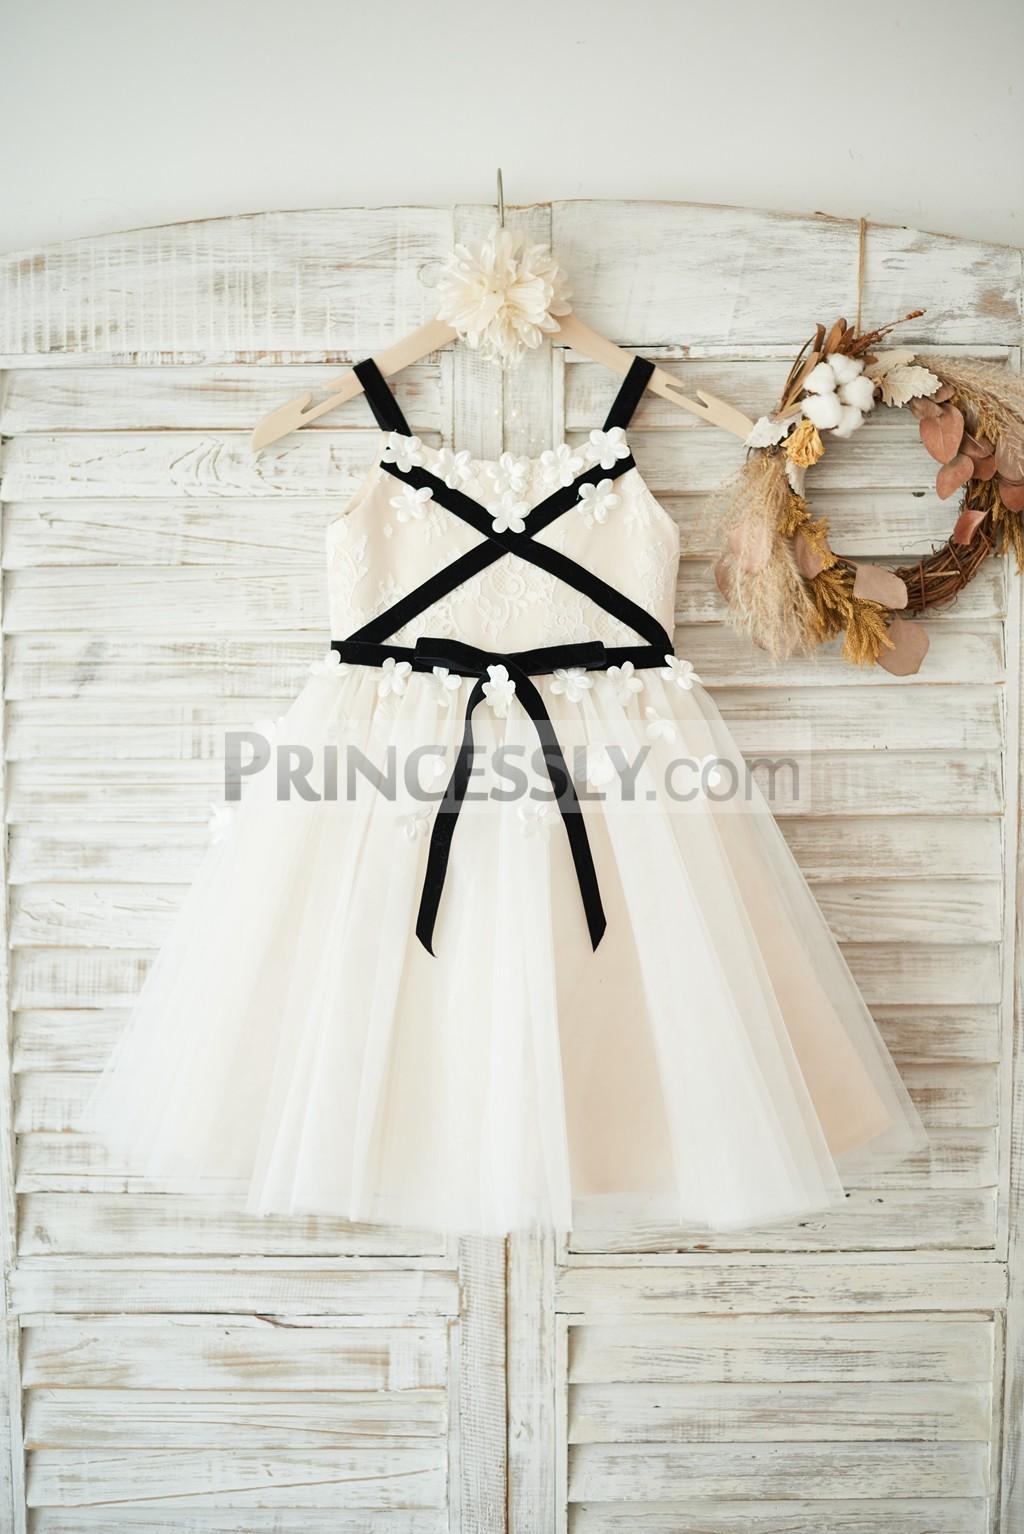 Shoulder straps ivory lace champagne tulle flower girl dress